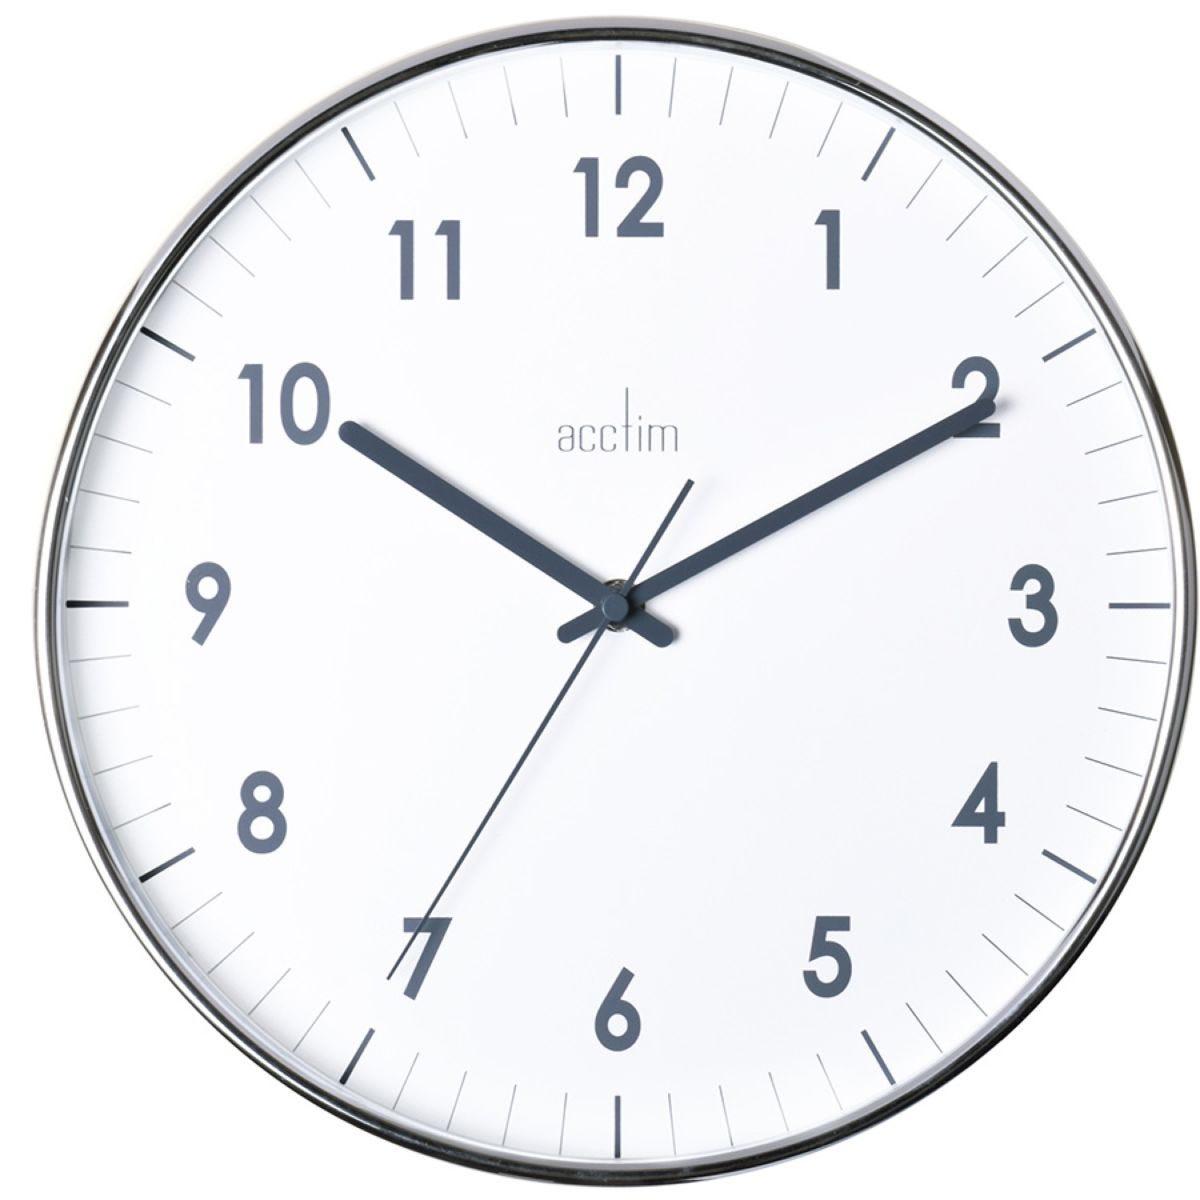 Acctim Jensen Wall Clock - Chrome